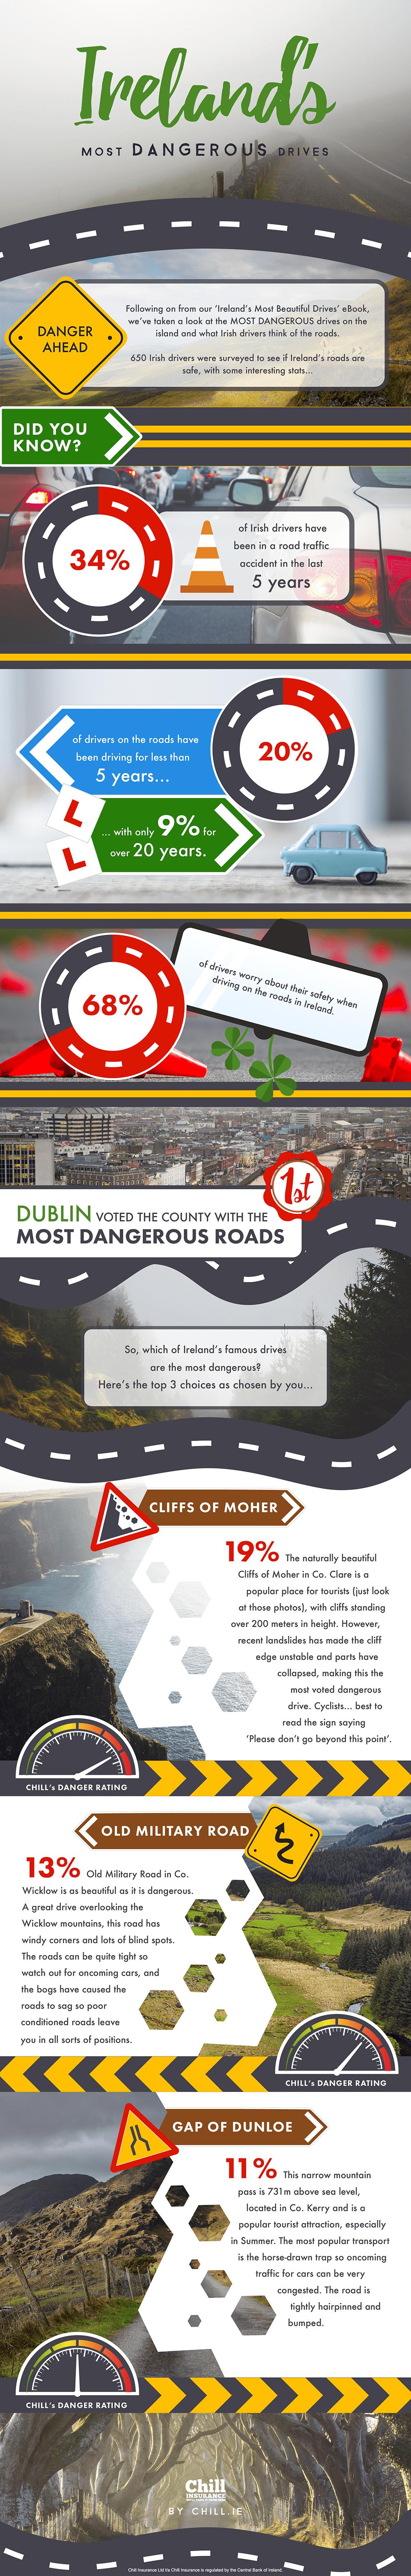 dangerous-drives Ireland